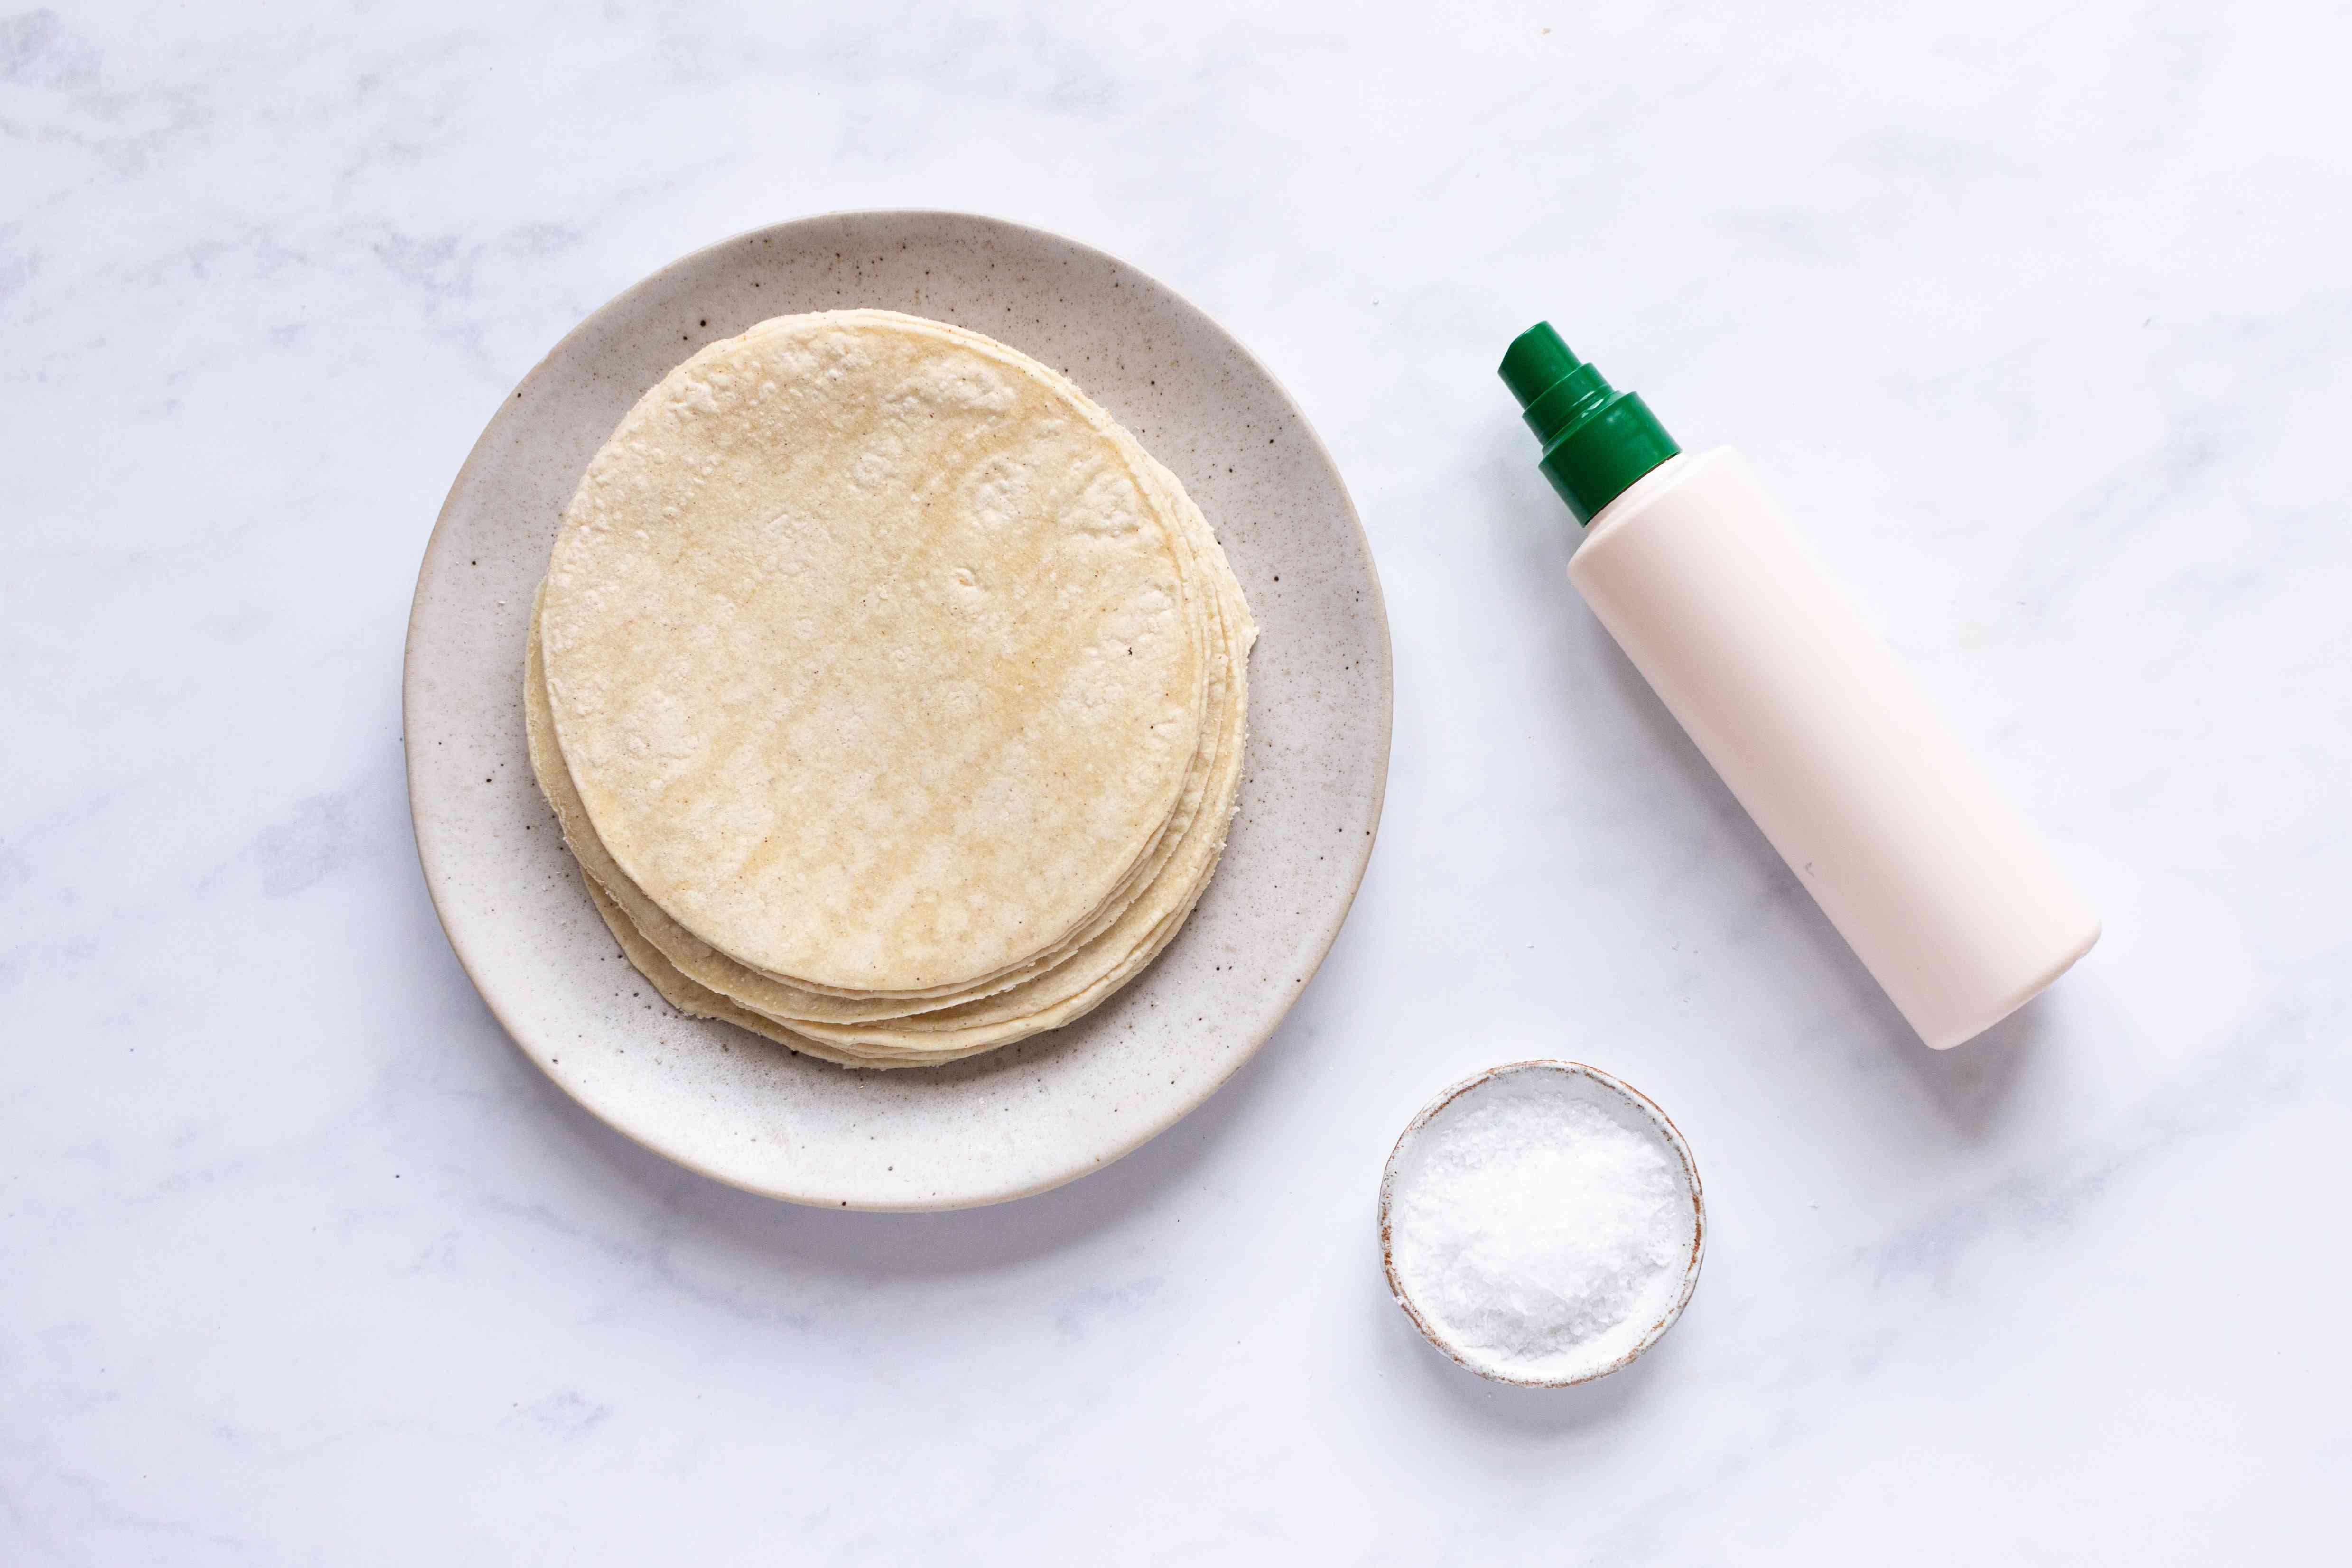 Baked Totopos ingredients